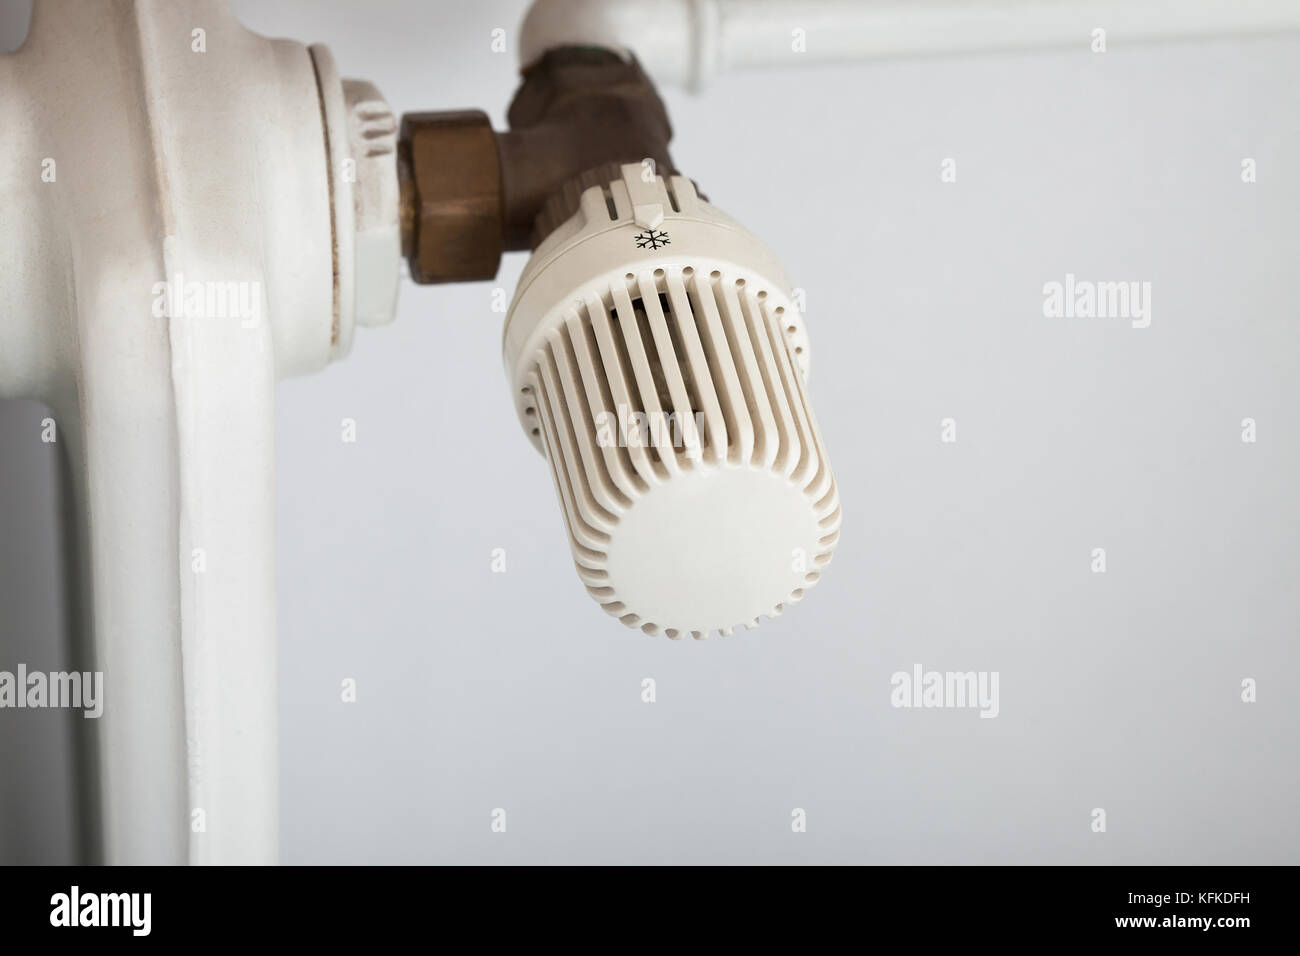 Closeup photo of temperature control on radiator - Stock Image